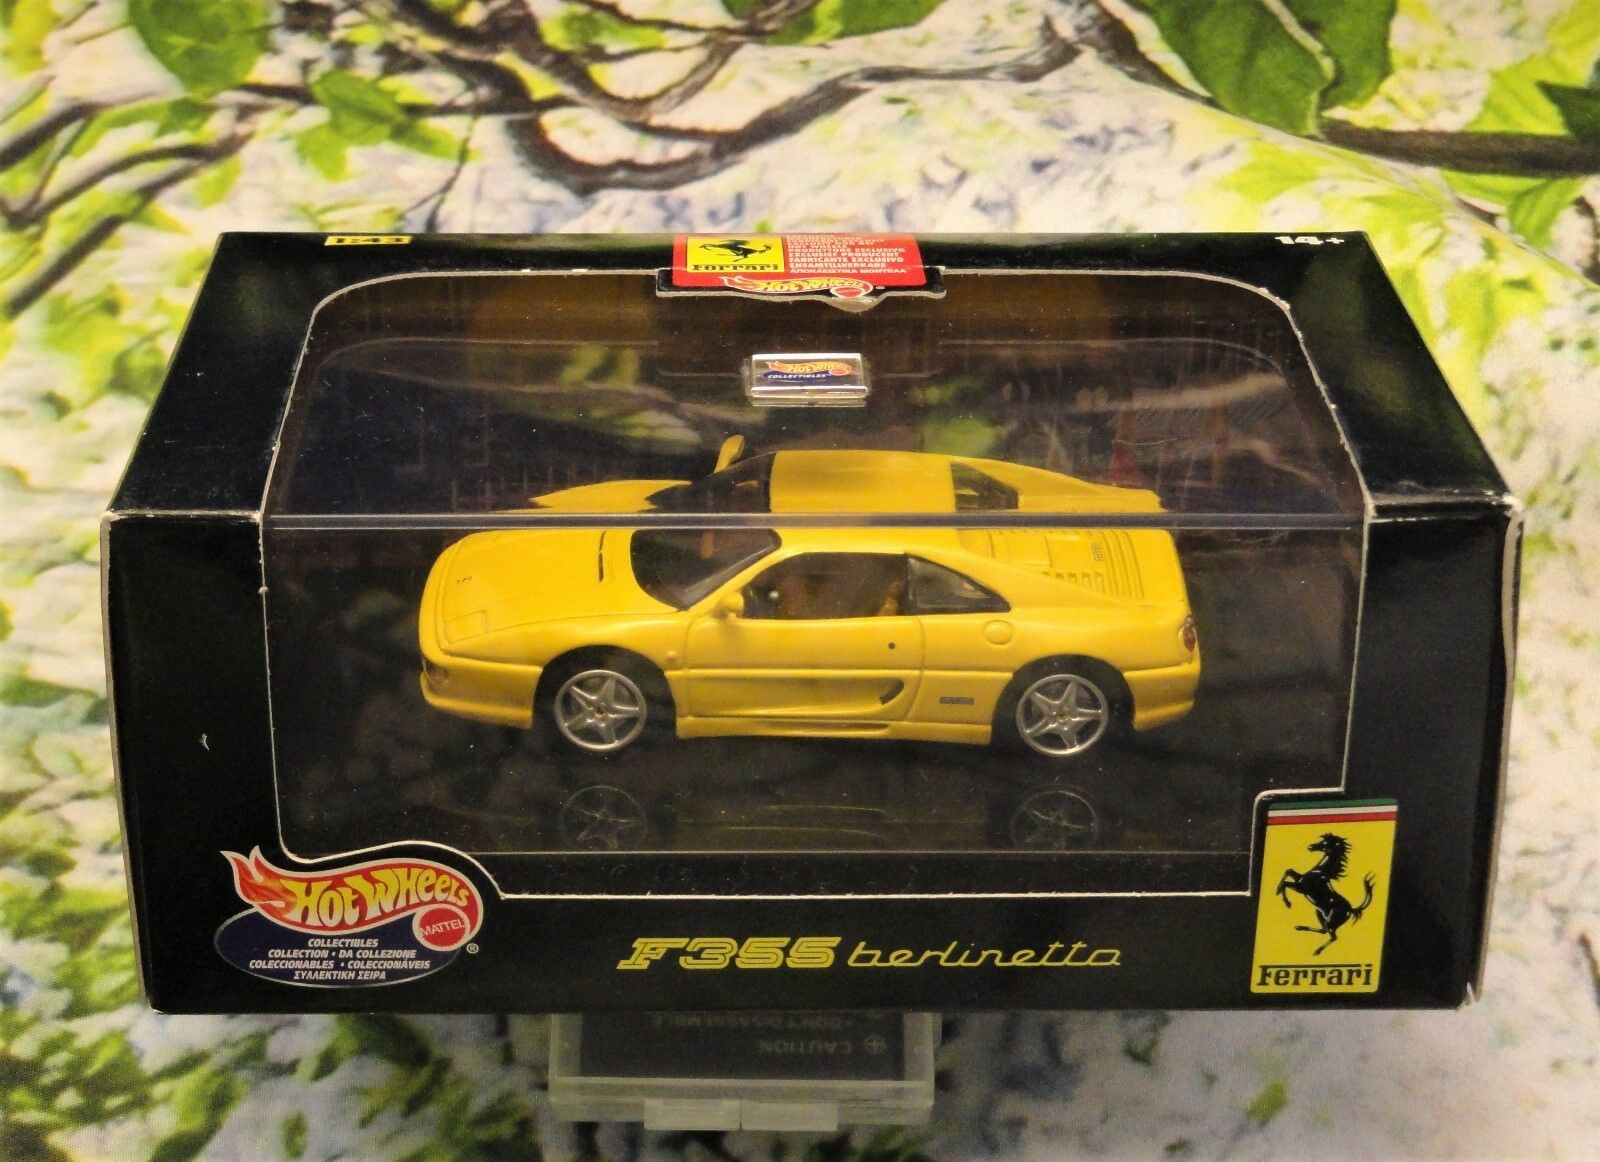 Ferrari  f355 berlinetta gelb 1   Ferrari 43 hot wheels 5784fb